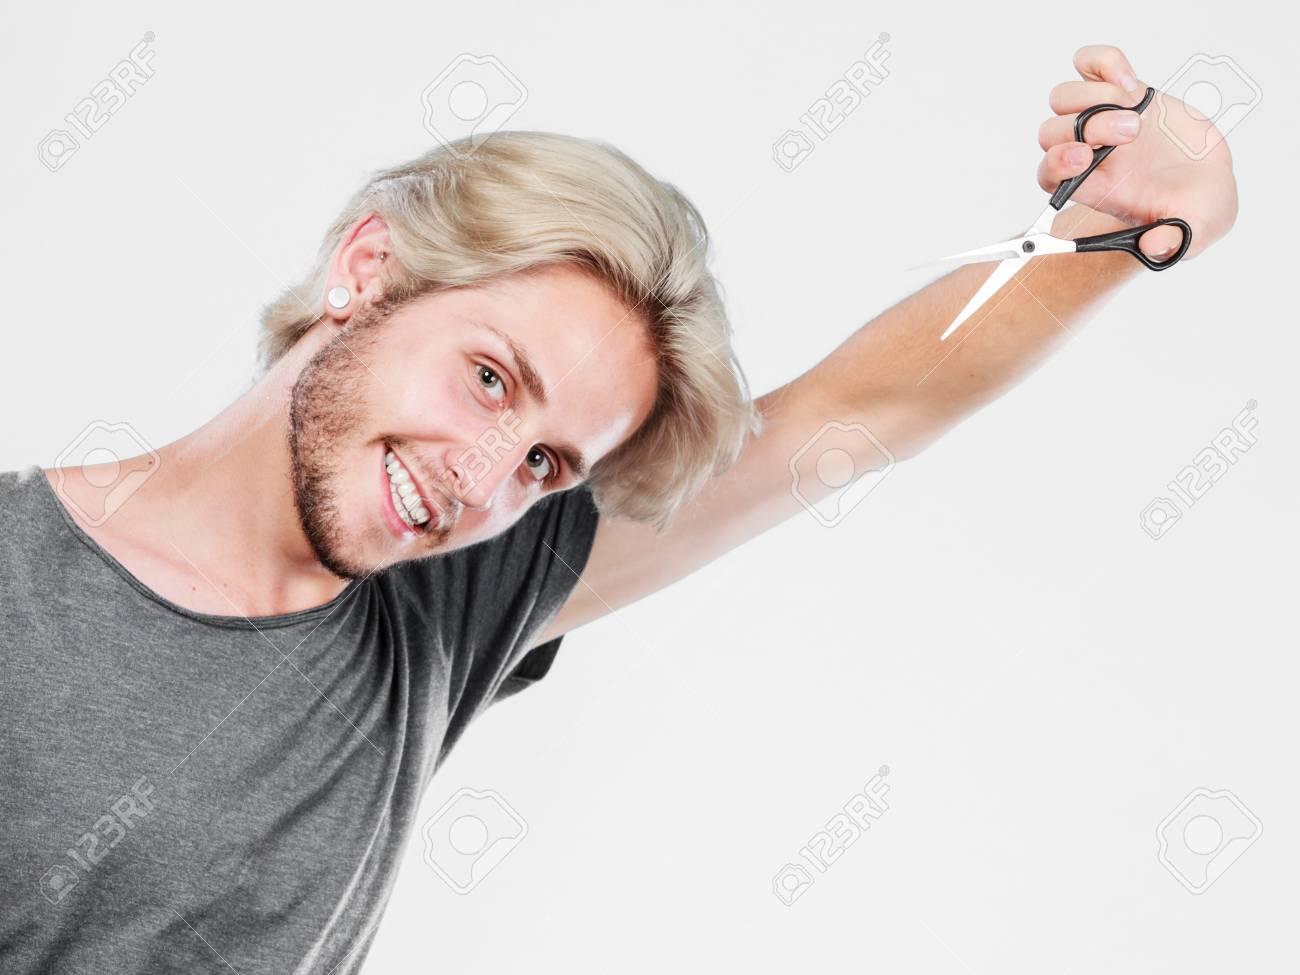 How To Cut Boys Hair With Scissors Best Hair 2018